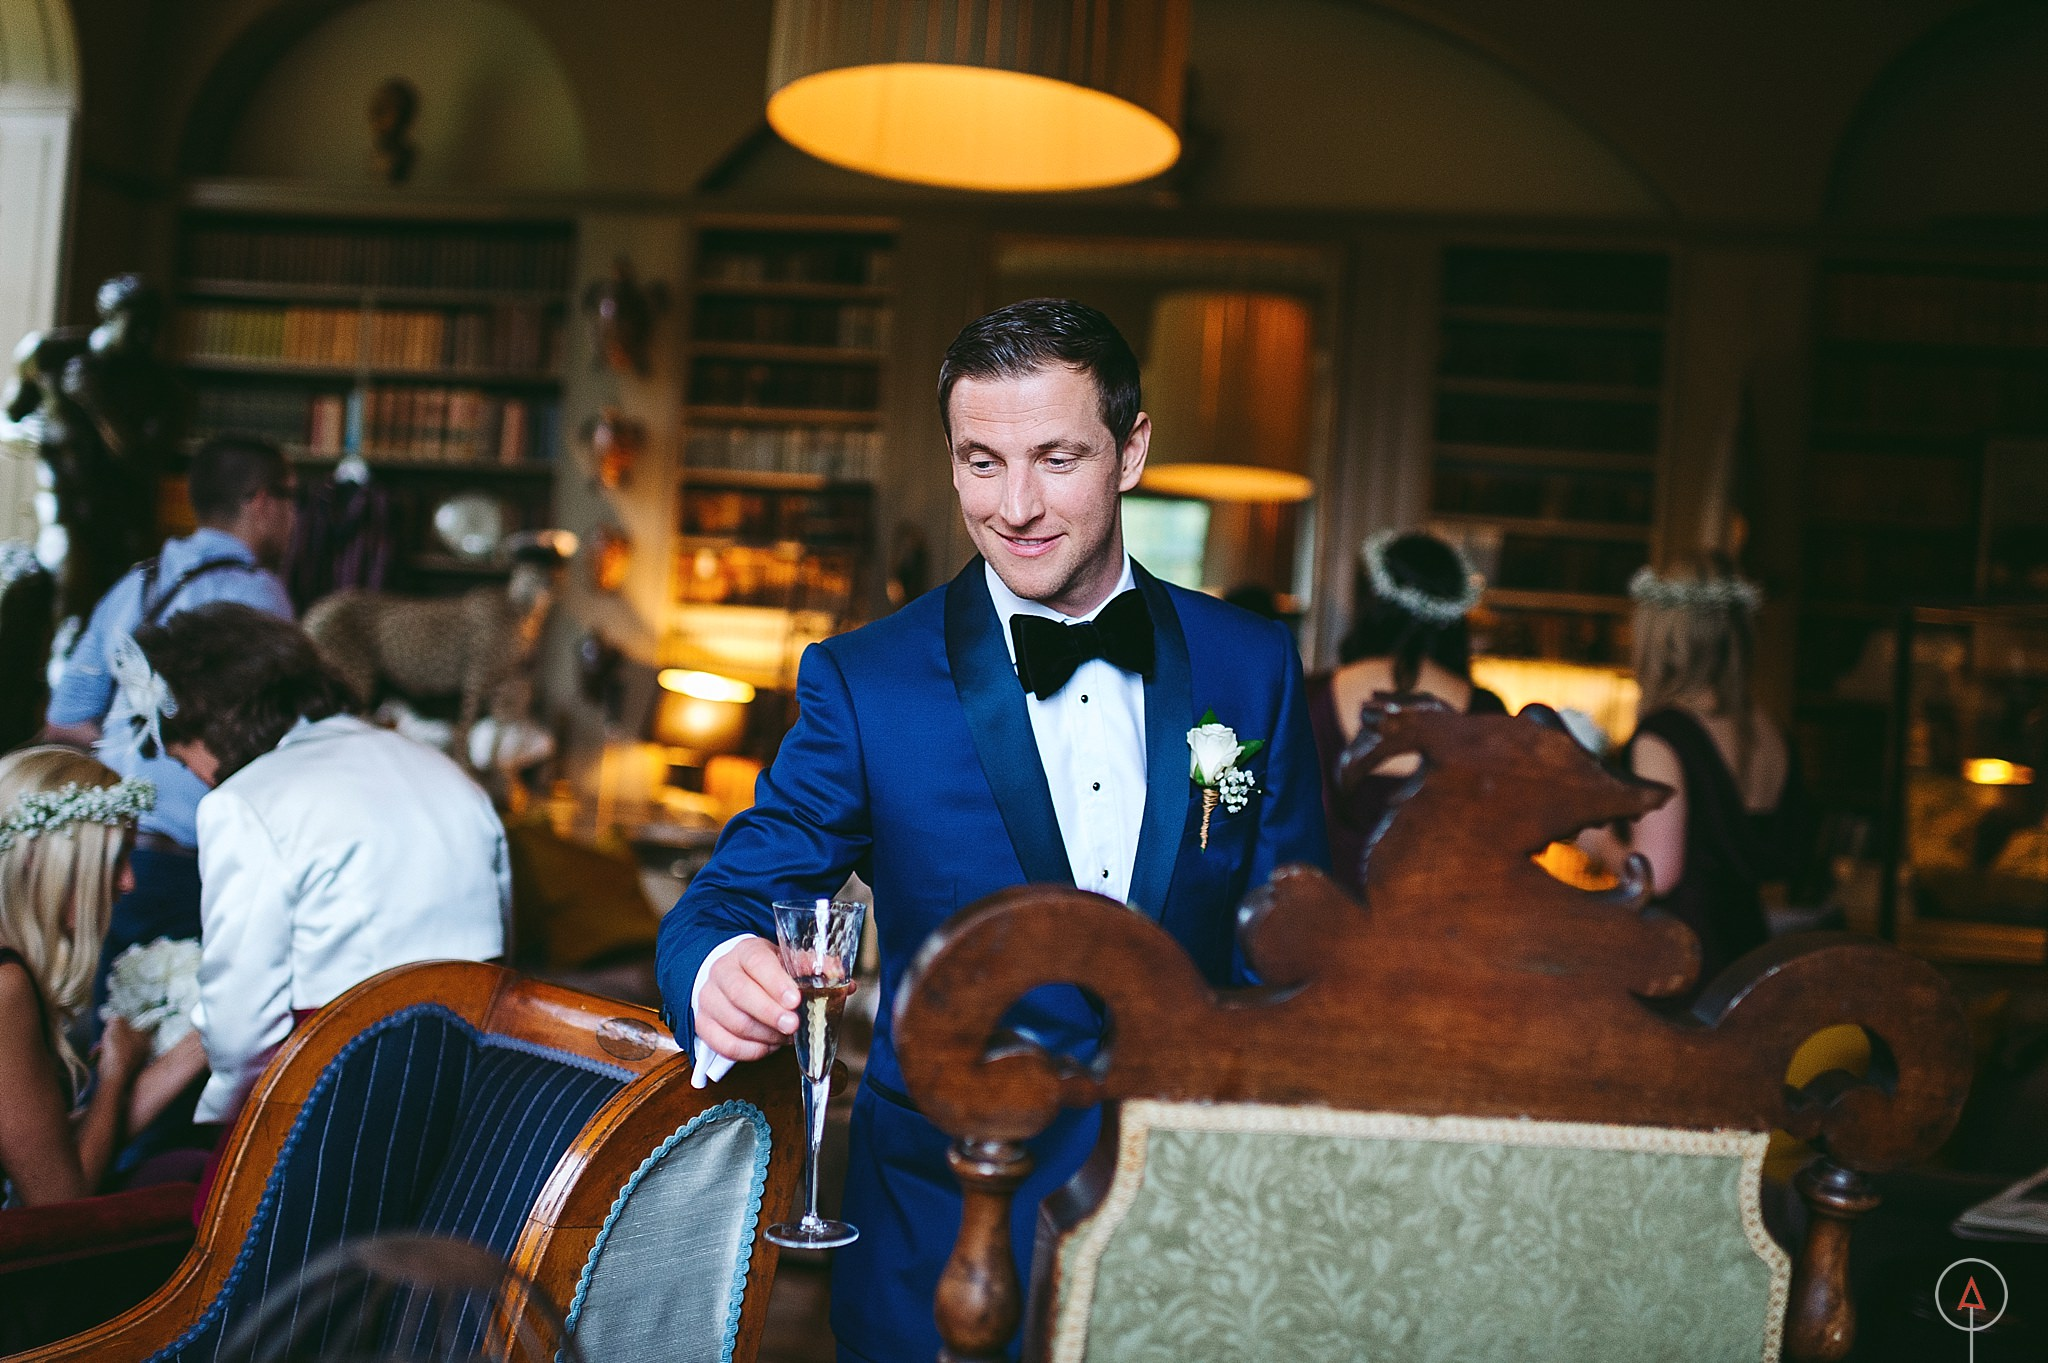 cardiff-wedding-photographer-aga-tomaszek_0269